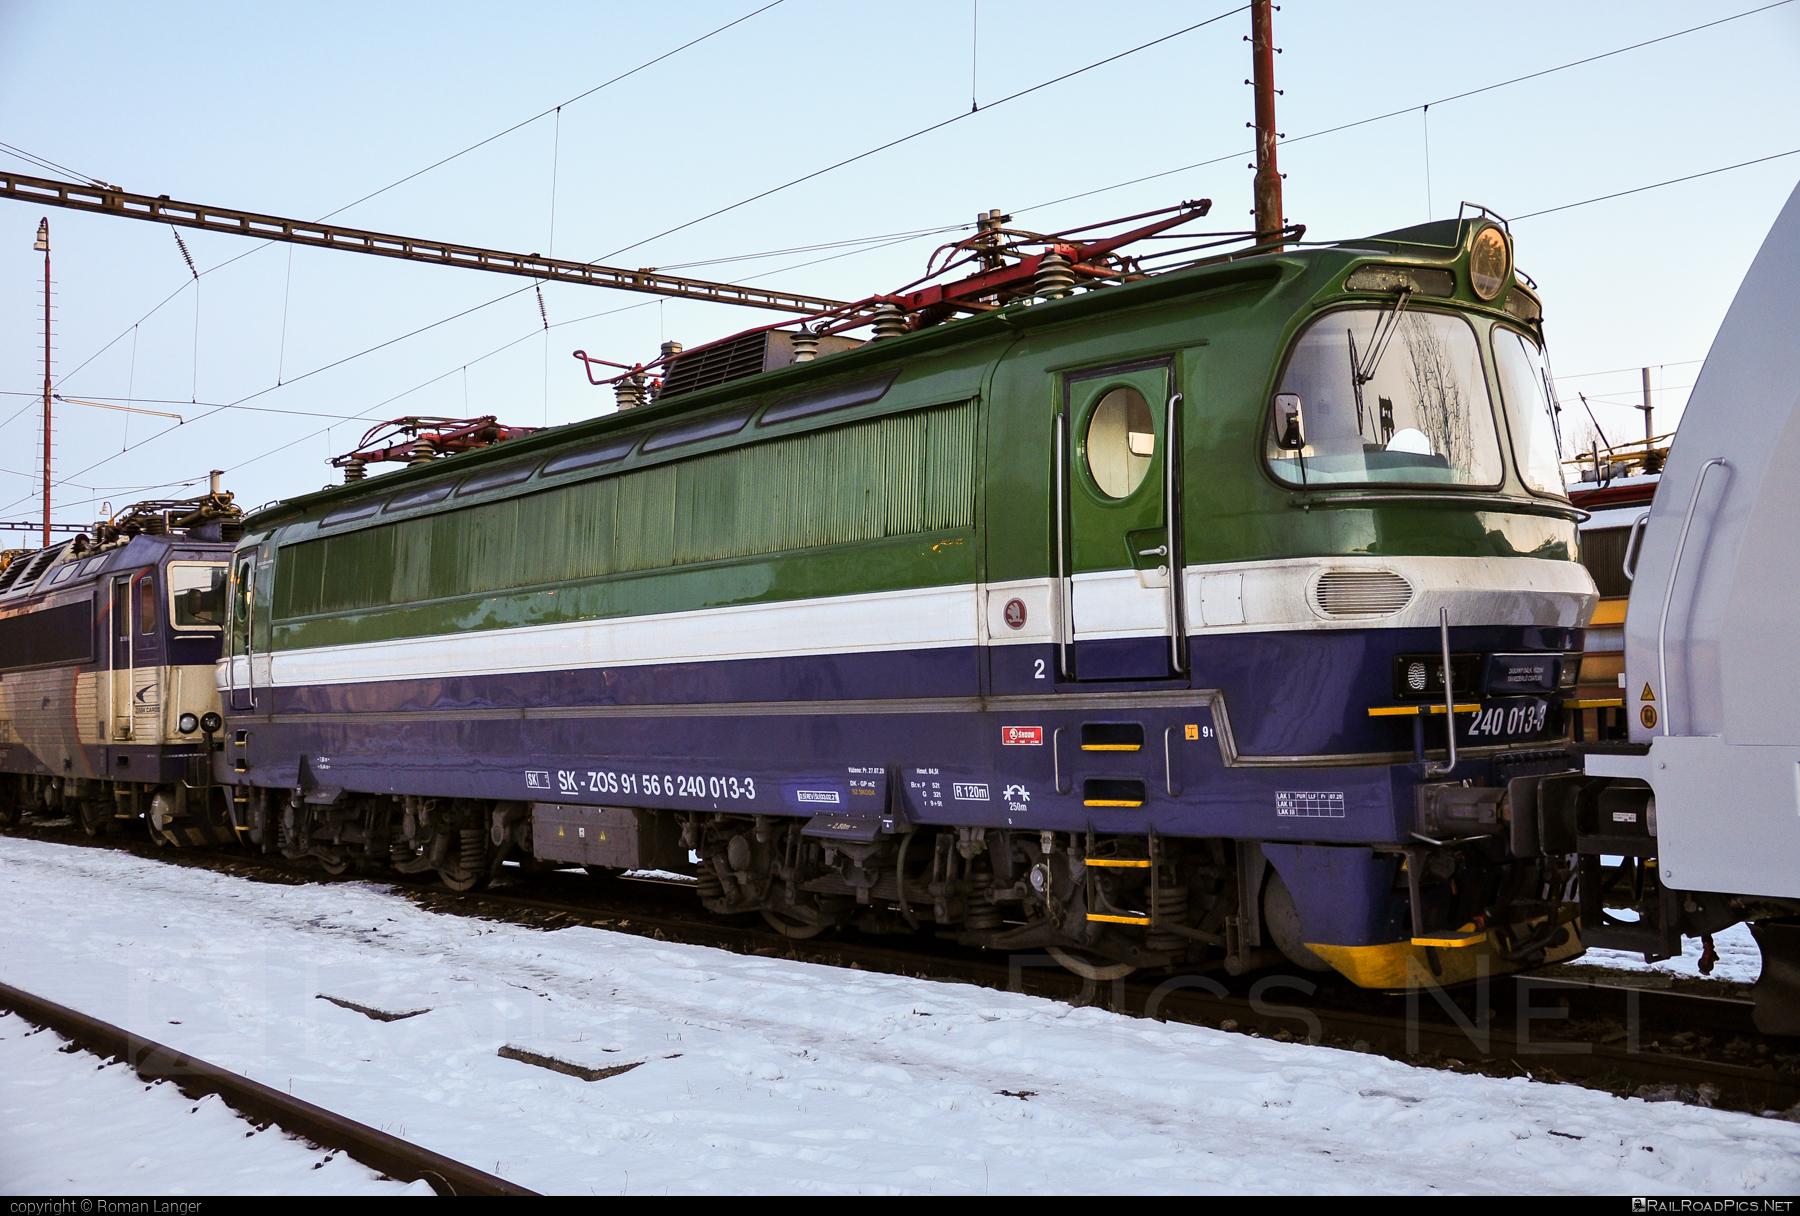 Škoda 47E - 240 013-3 operated by ZOS ZVOLEN s.r.o. #laminatka #locomotive240 #skoda #skoda47e #zos #zoszvolen